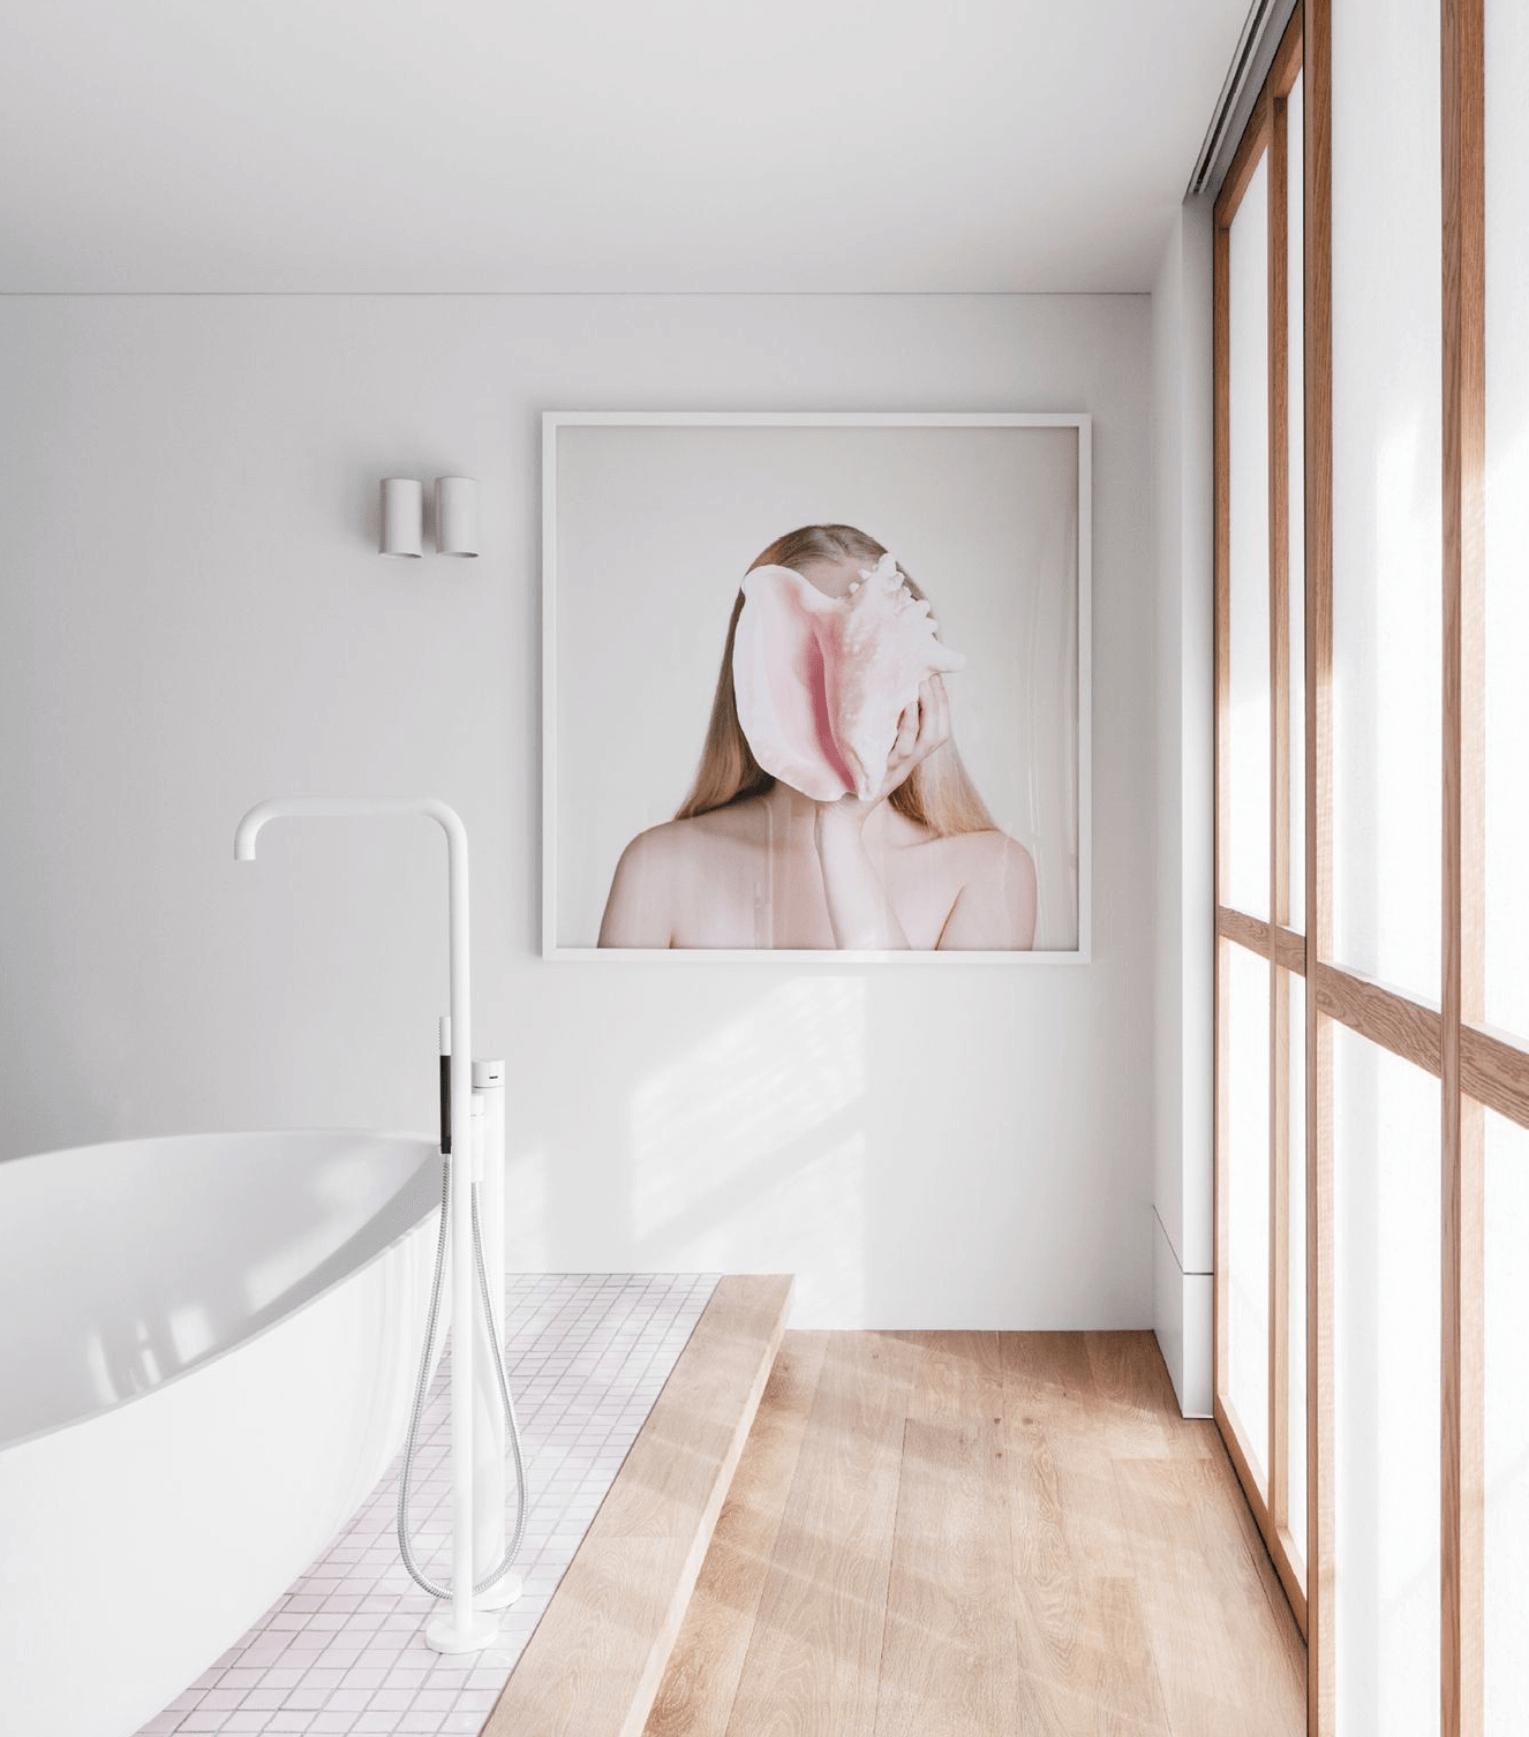 Modern Pink zen Bathroom, Soji Screen, Patricia Hicks art, Boffi Iceland tub, white Vola tub filler